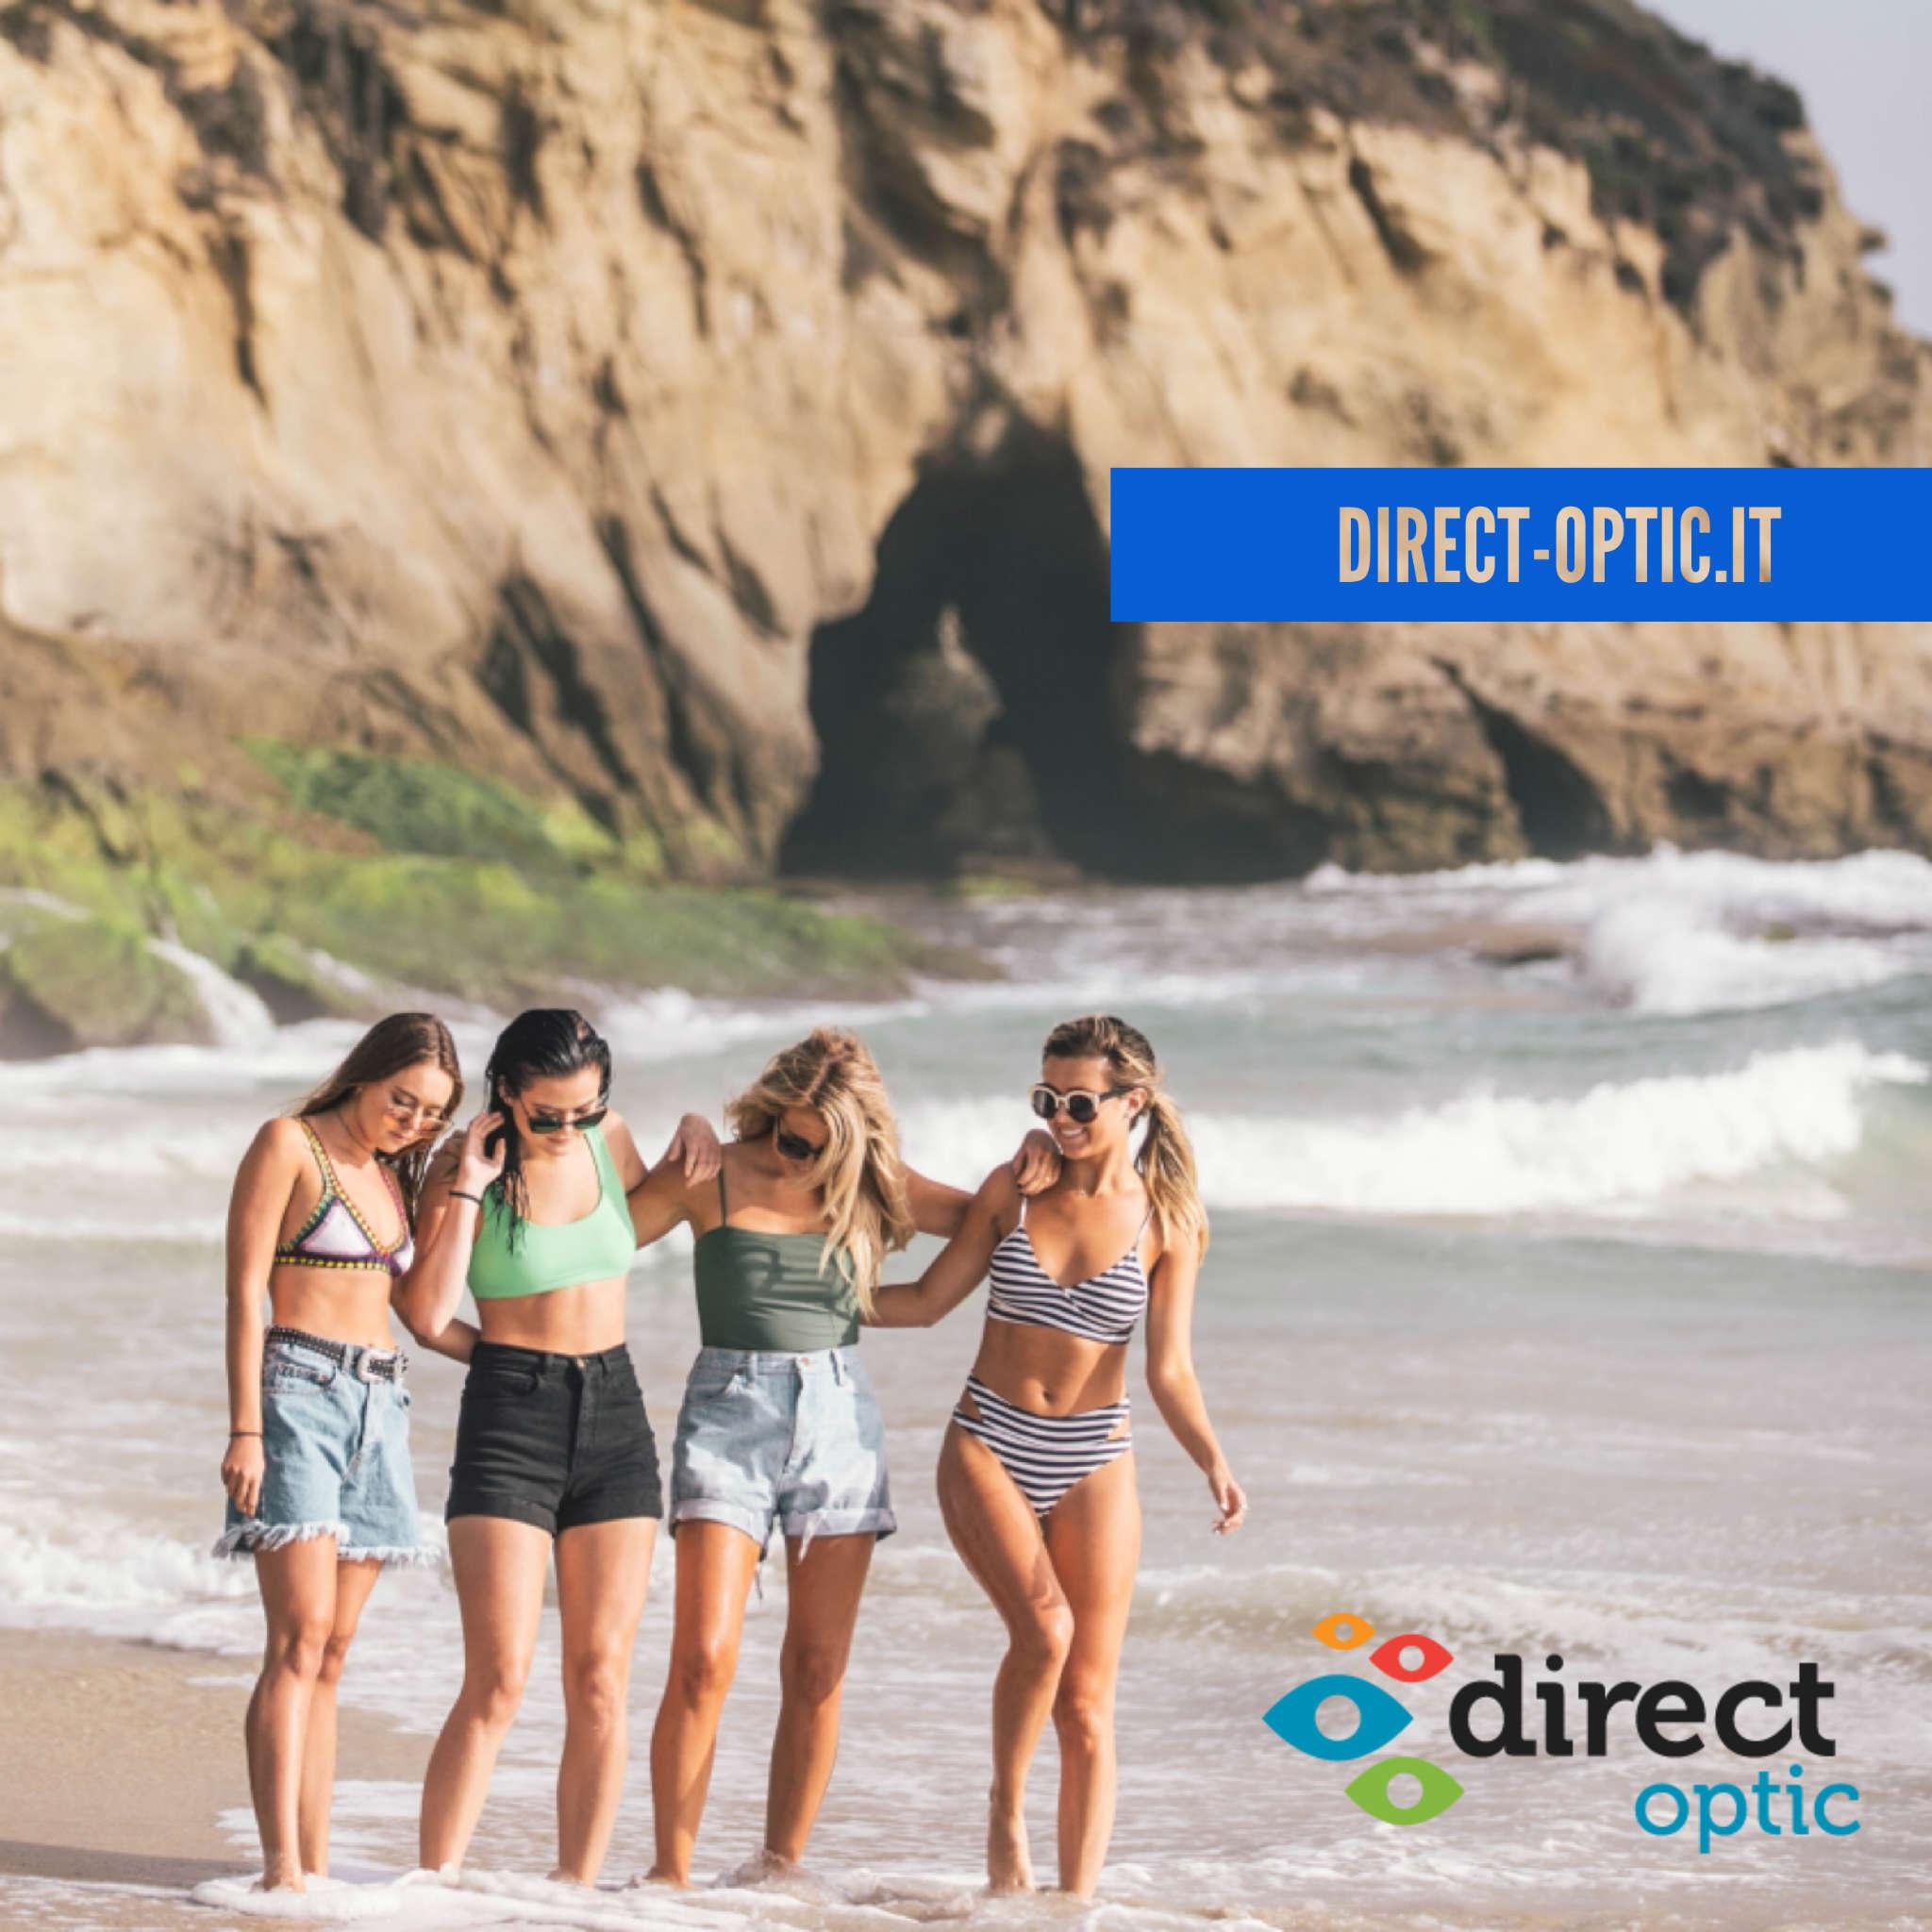 offerta passaparola direct optic occhiali online lowcost di qualità